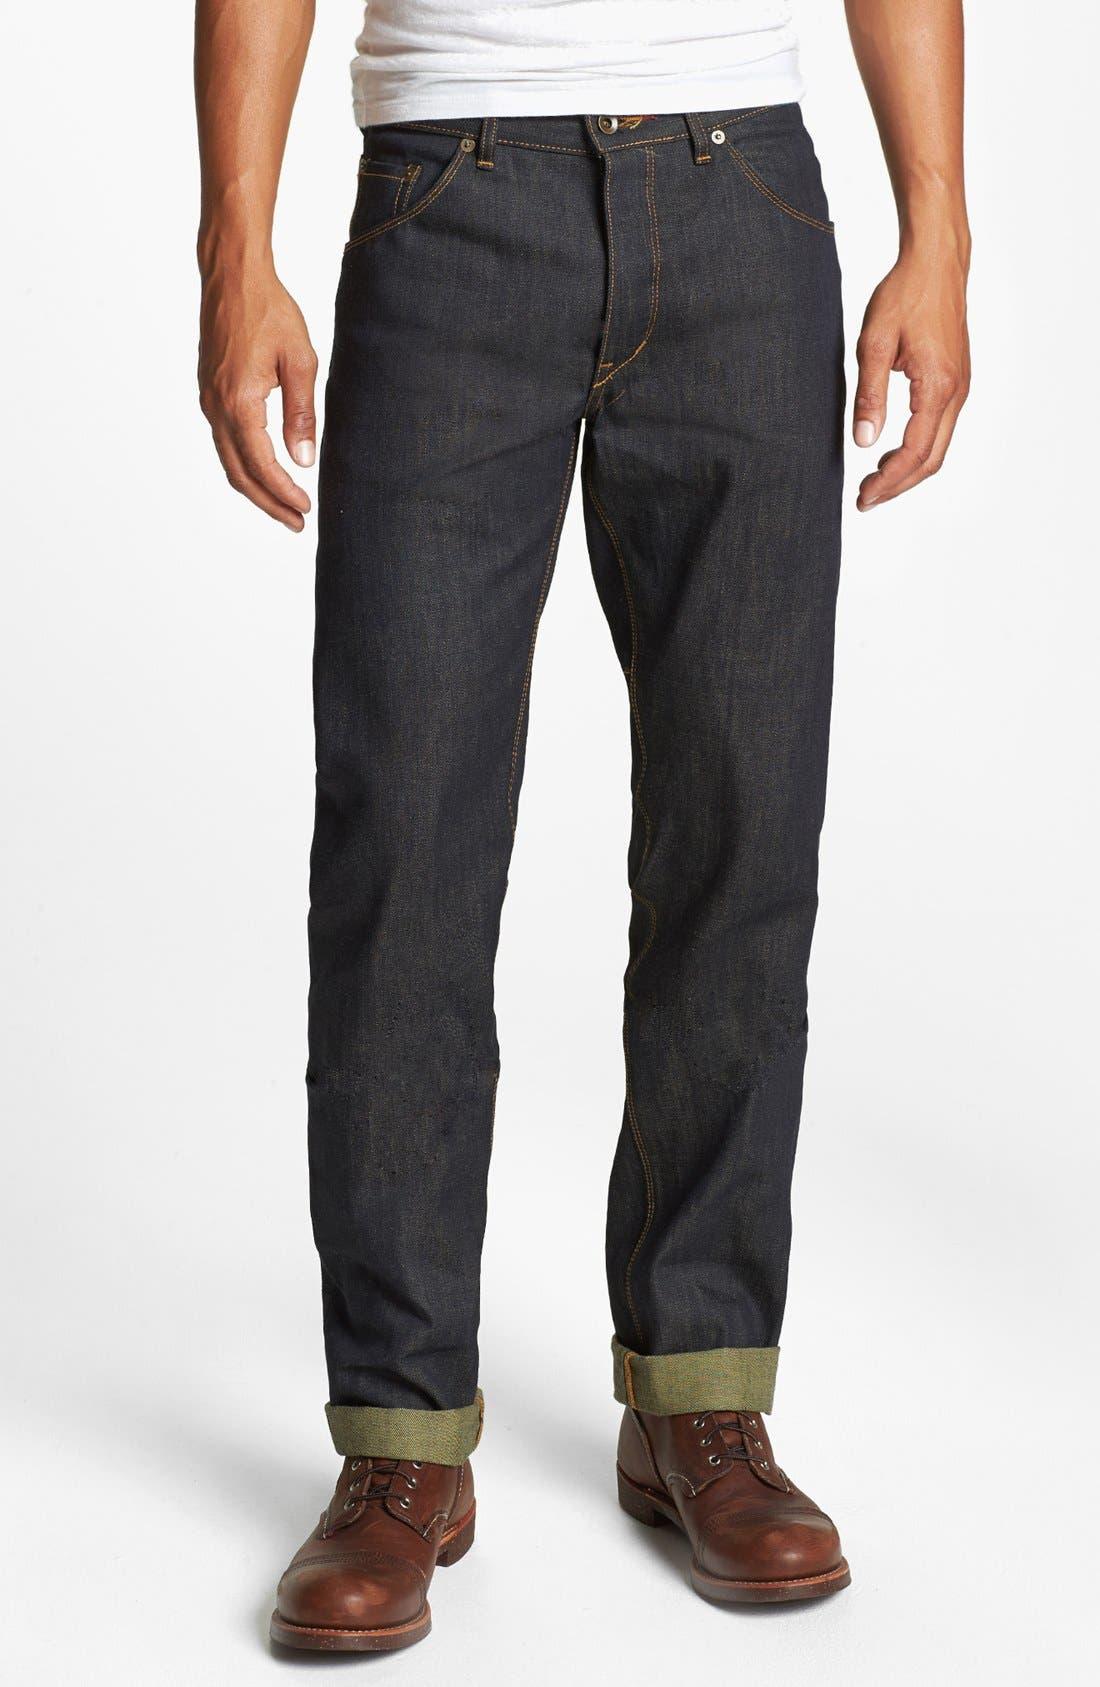 Alternate Image 2  - Raleigh Denim 'Jones' Slim Fit Raw Selvedge Jeans (Original Selvage)